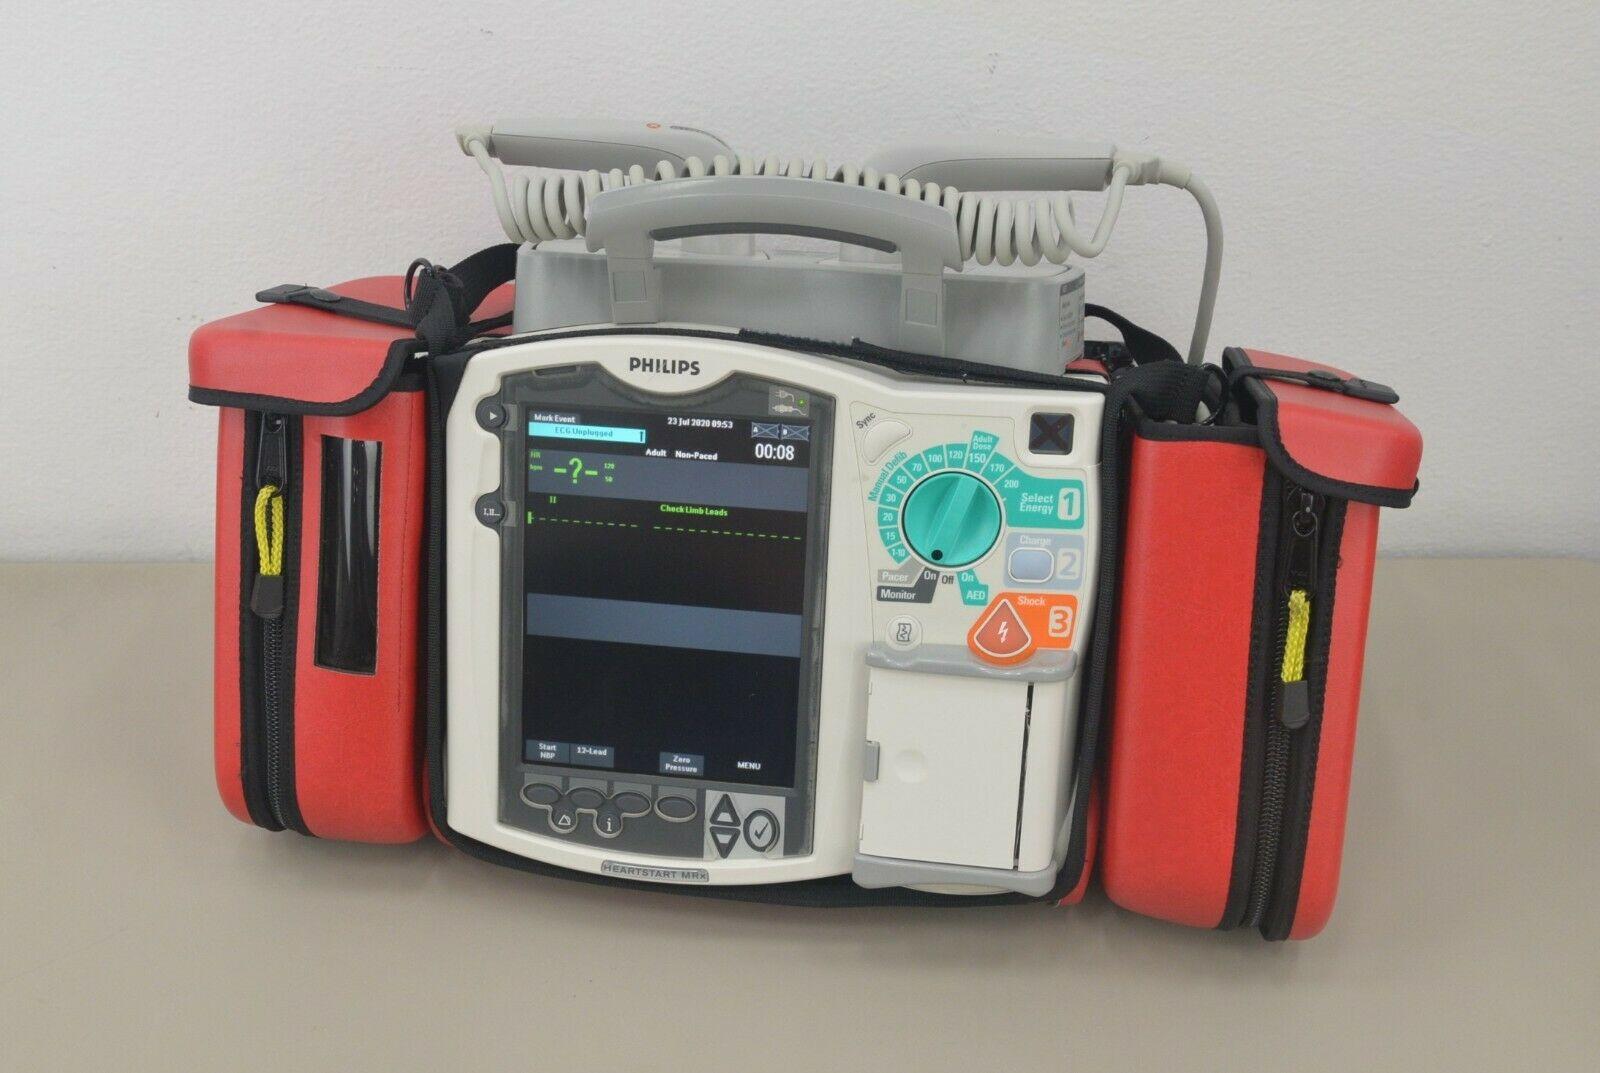 Philips HeartStart MRx M3536A 12-Lead ECG SPo2 NIBP Monitor w/ Paddles (23230) – Rhino Trade LLC